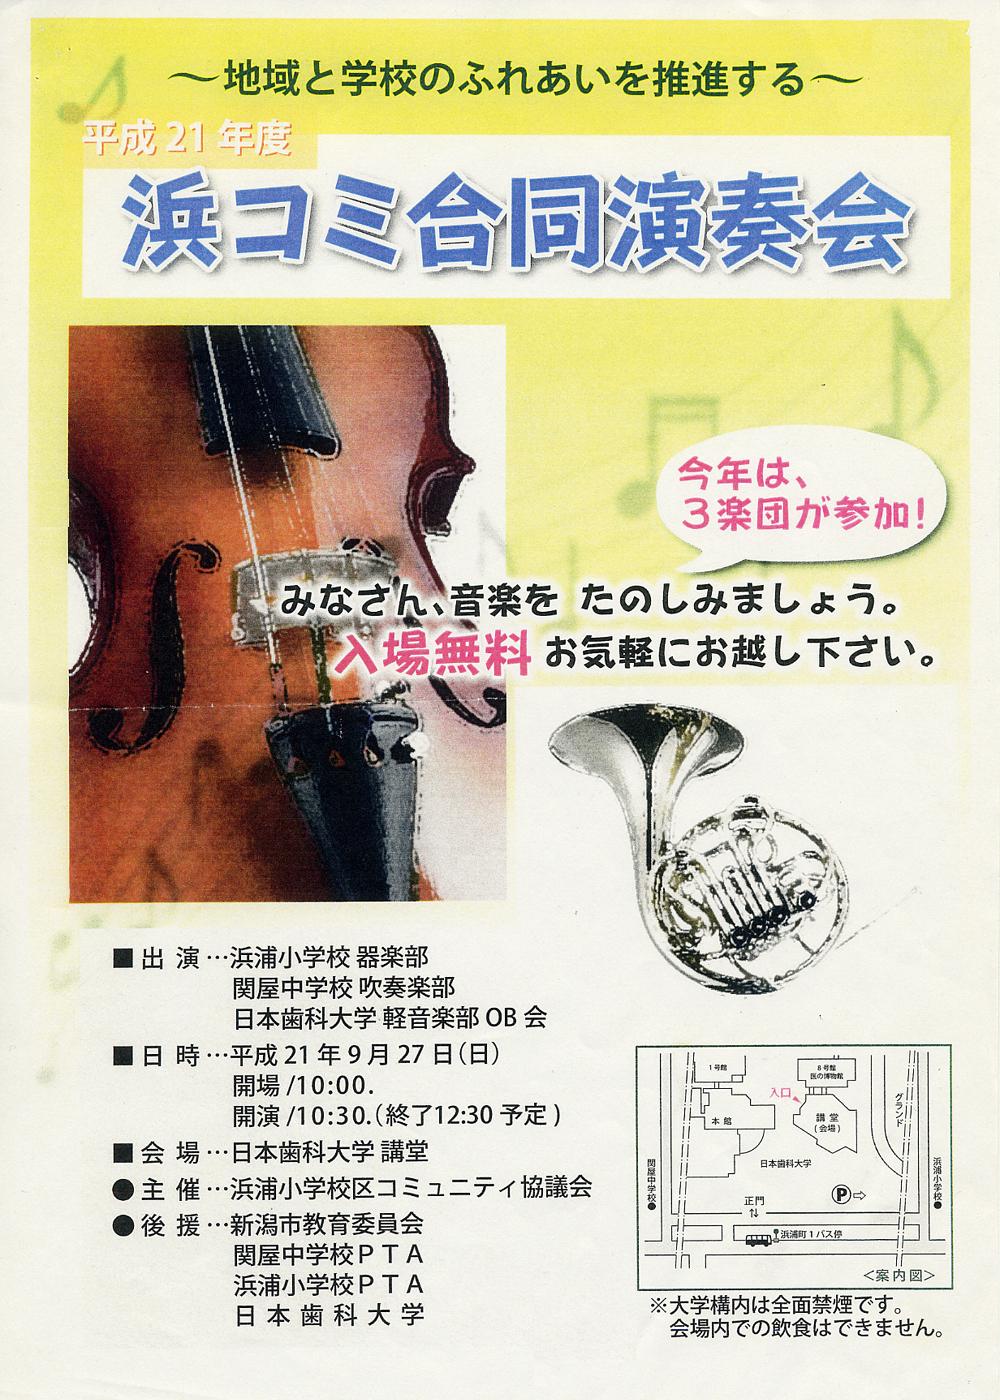 http://www.ngt.ndu.ac.jp/area/pic_hamacom03.jpg